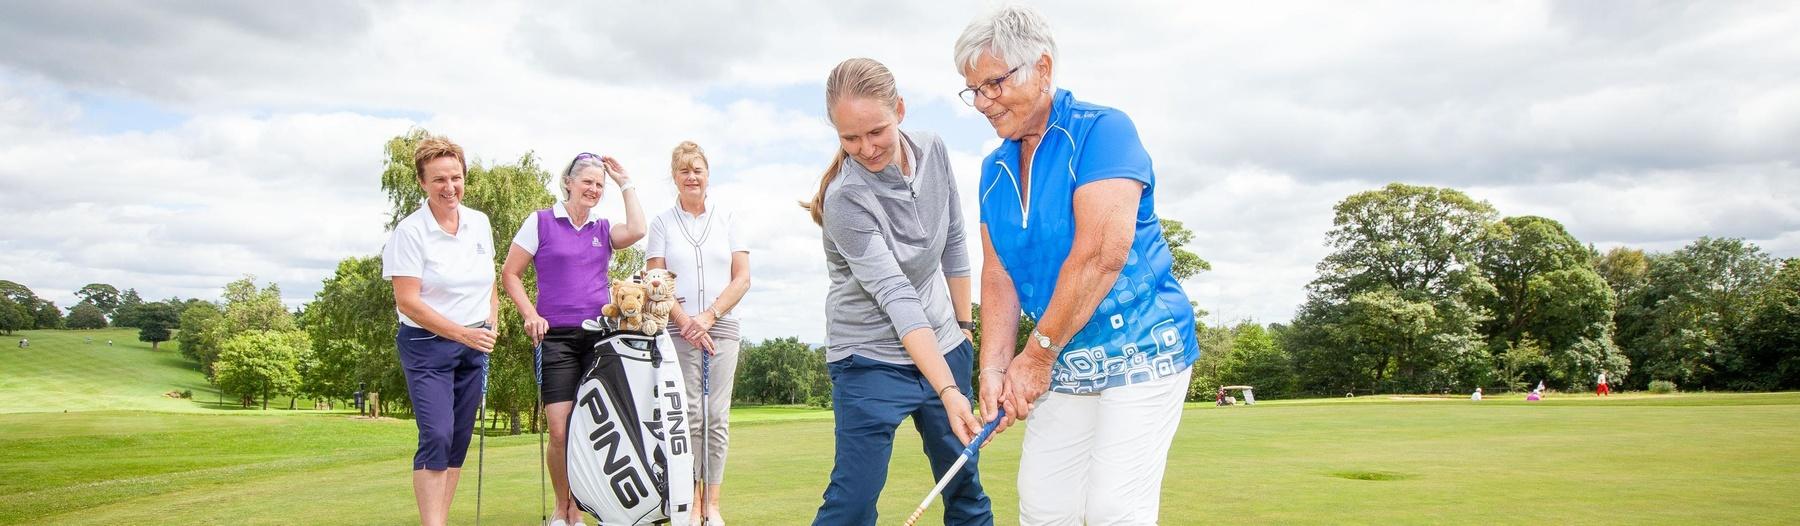 Macdonald Hotels headerGet Into Golf – Emma Goodard and players